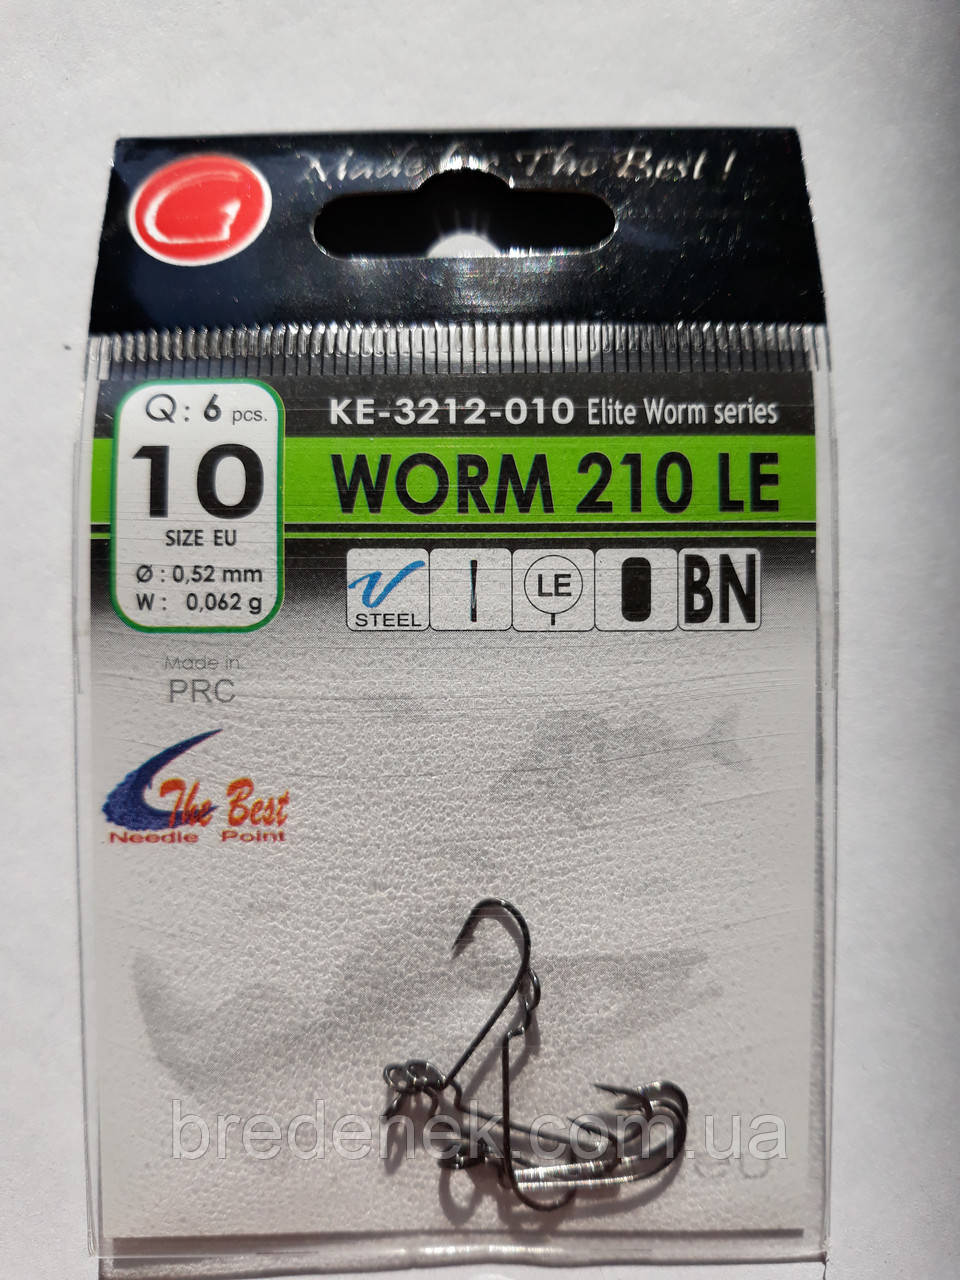 Крючки Gurza worm 210 le № 10